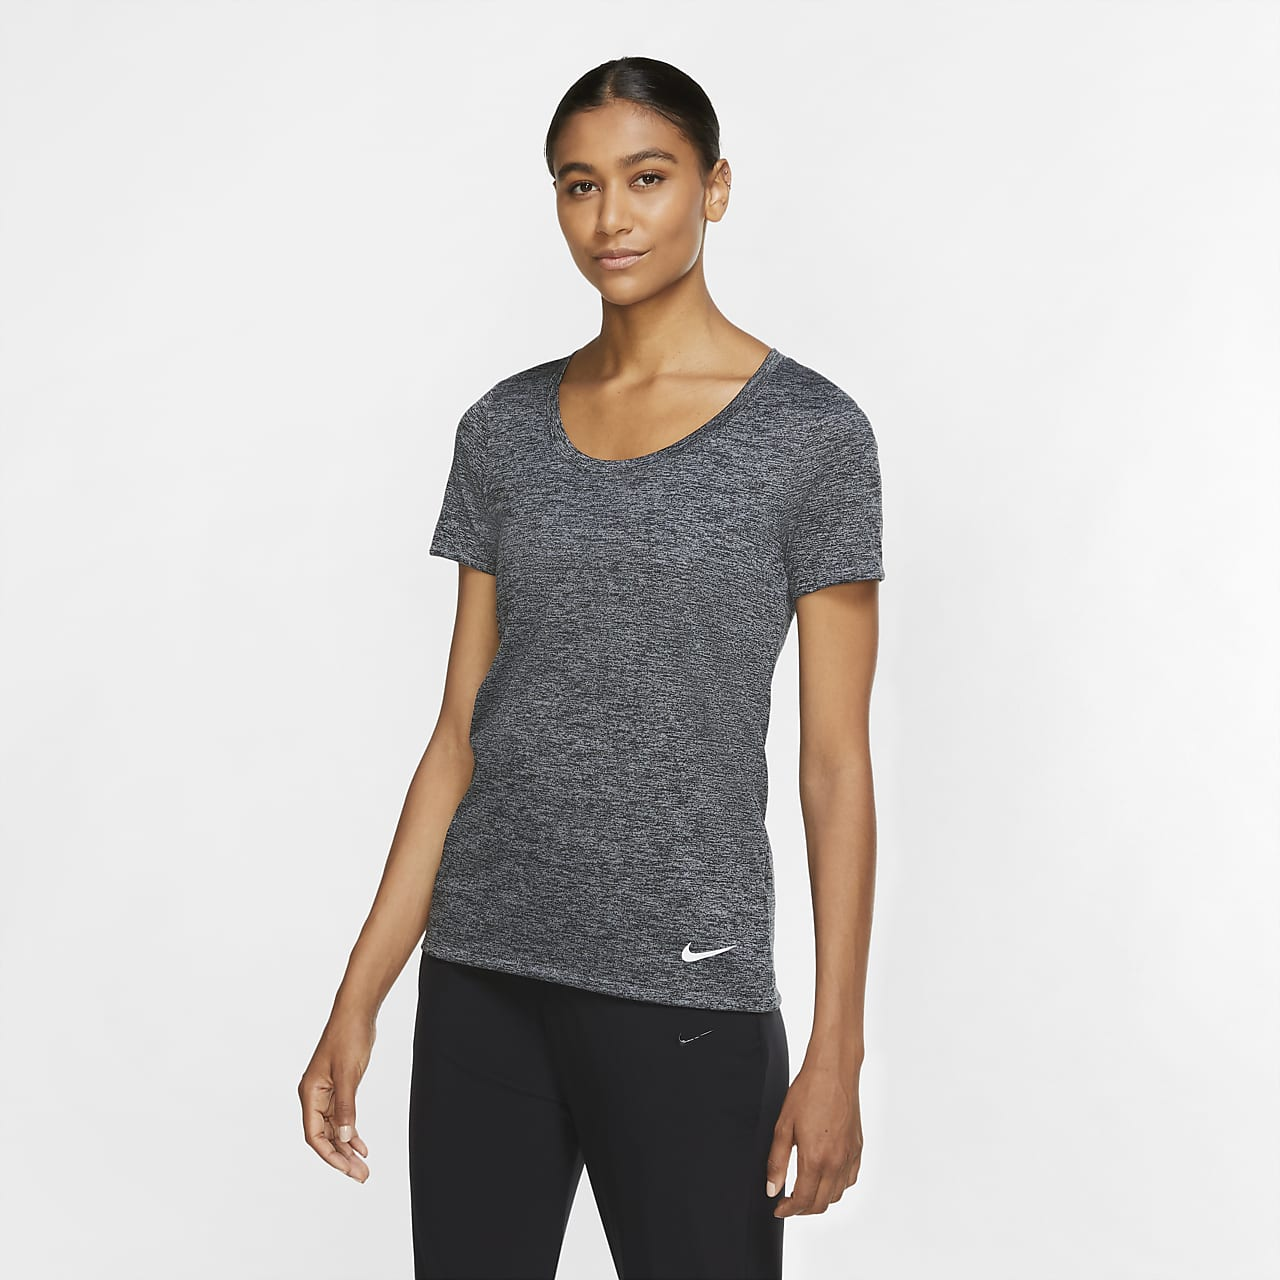 Nike Dry Women's Training T-Shirt